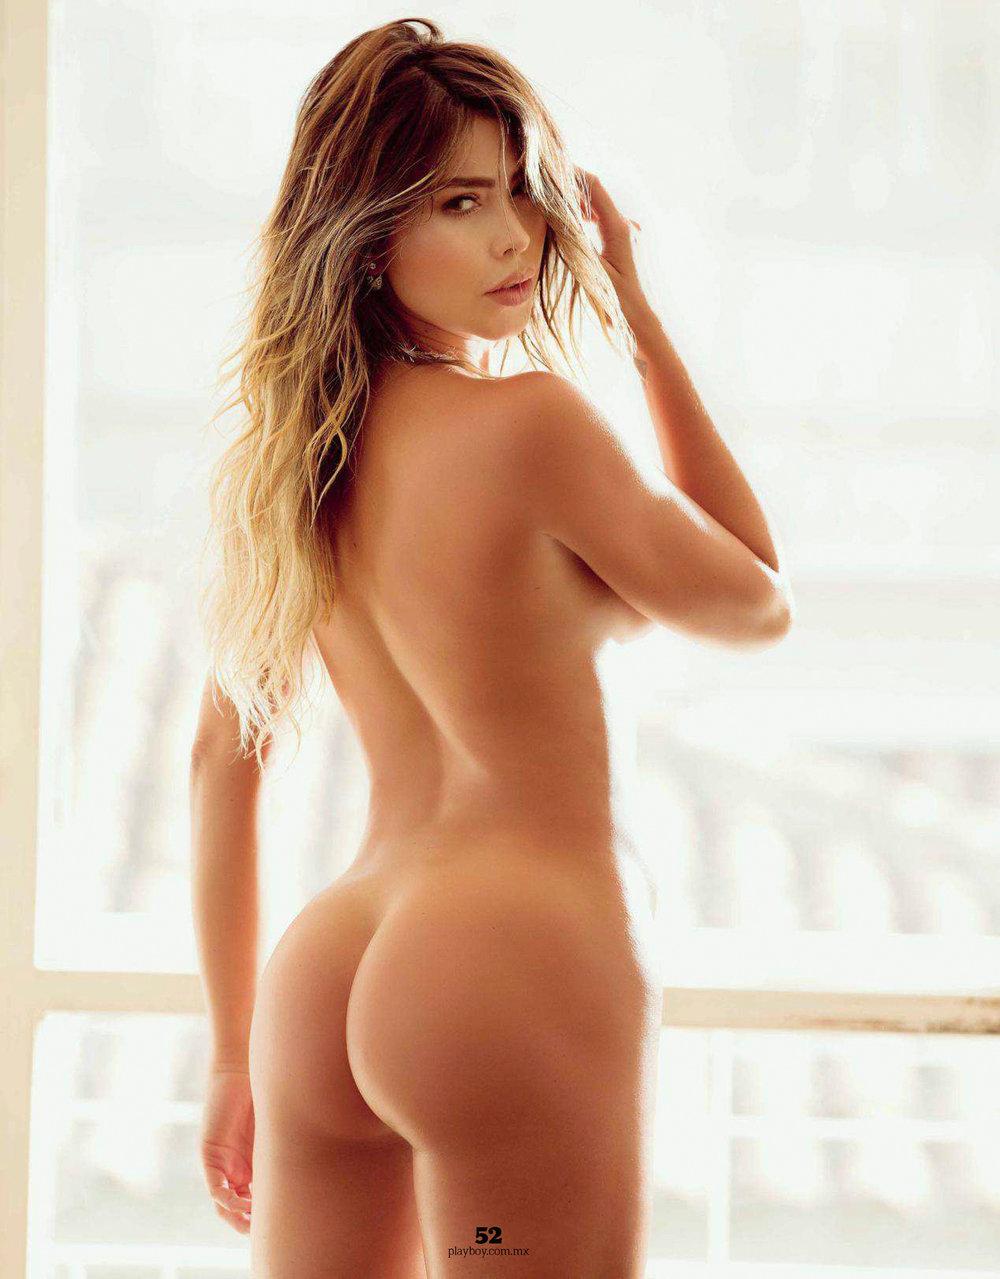 fabitogomez_201805-Playboy México-58.jpg